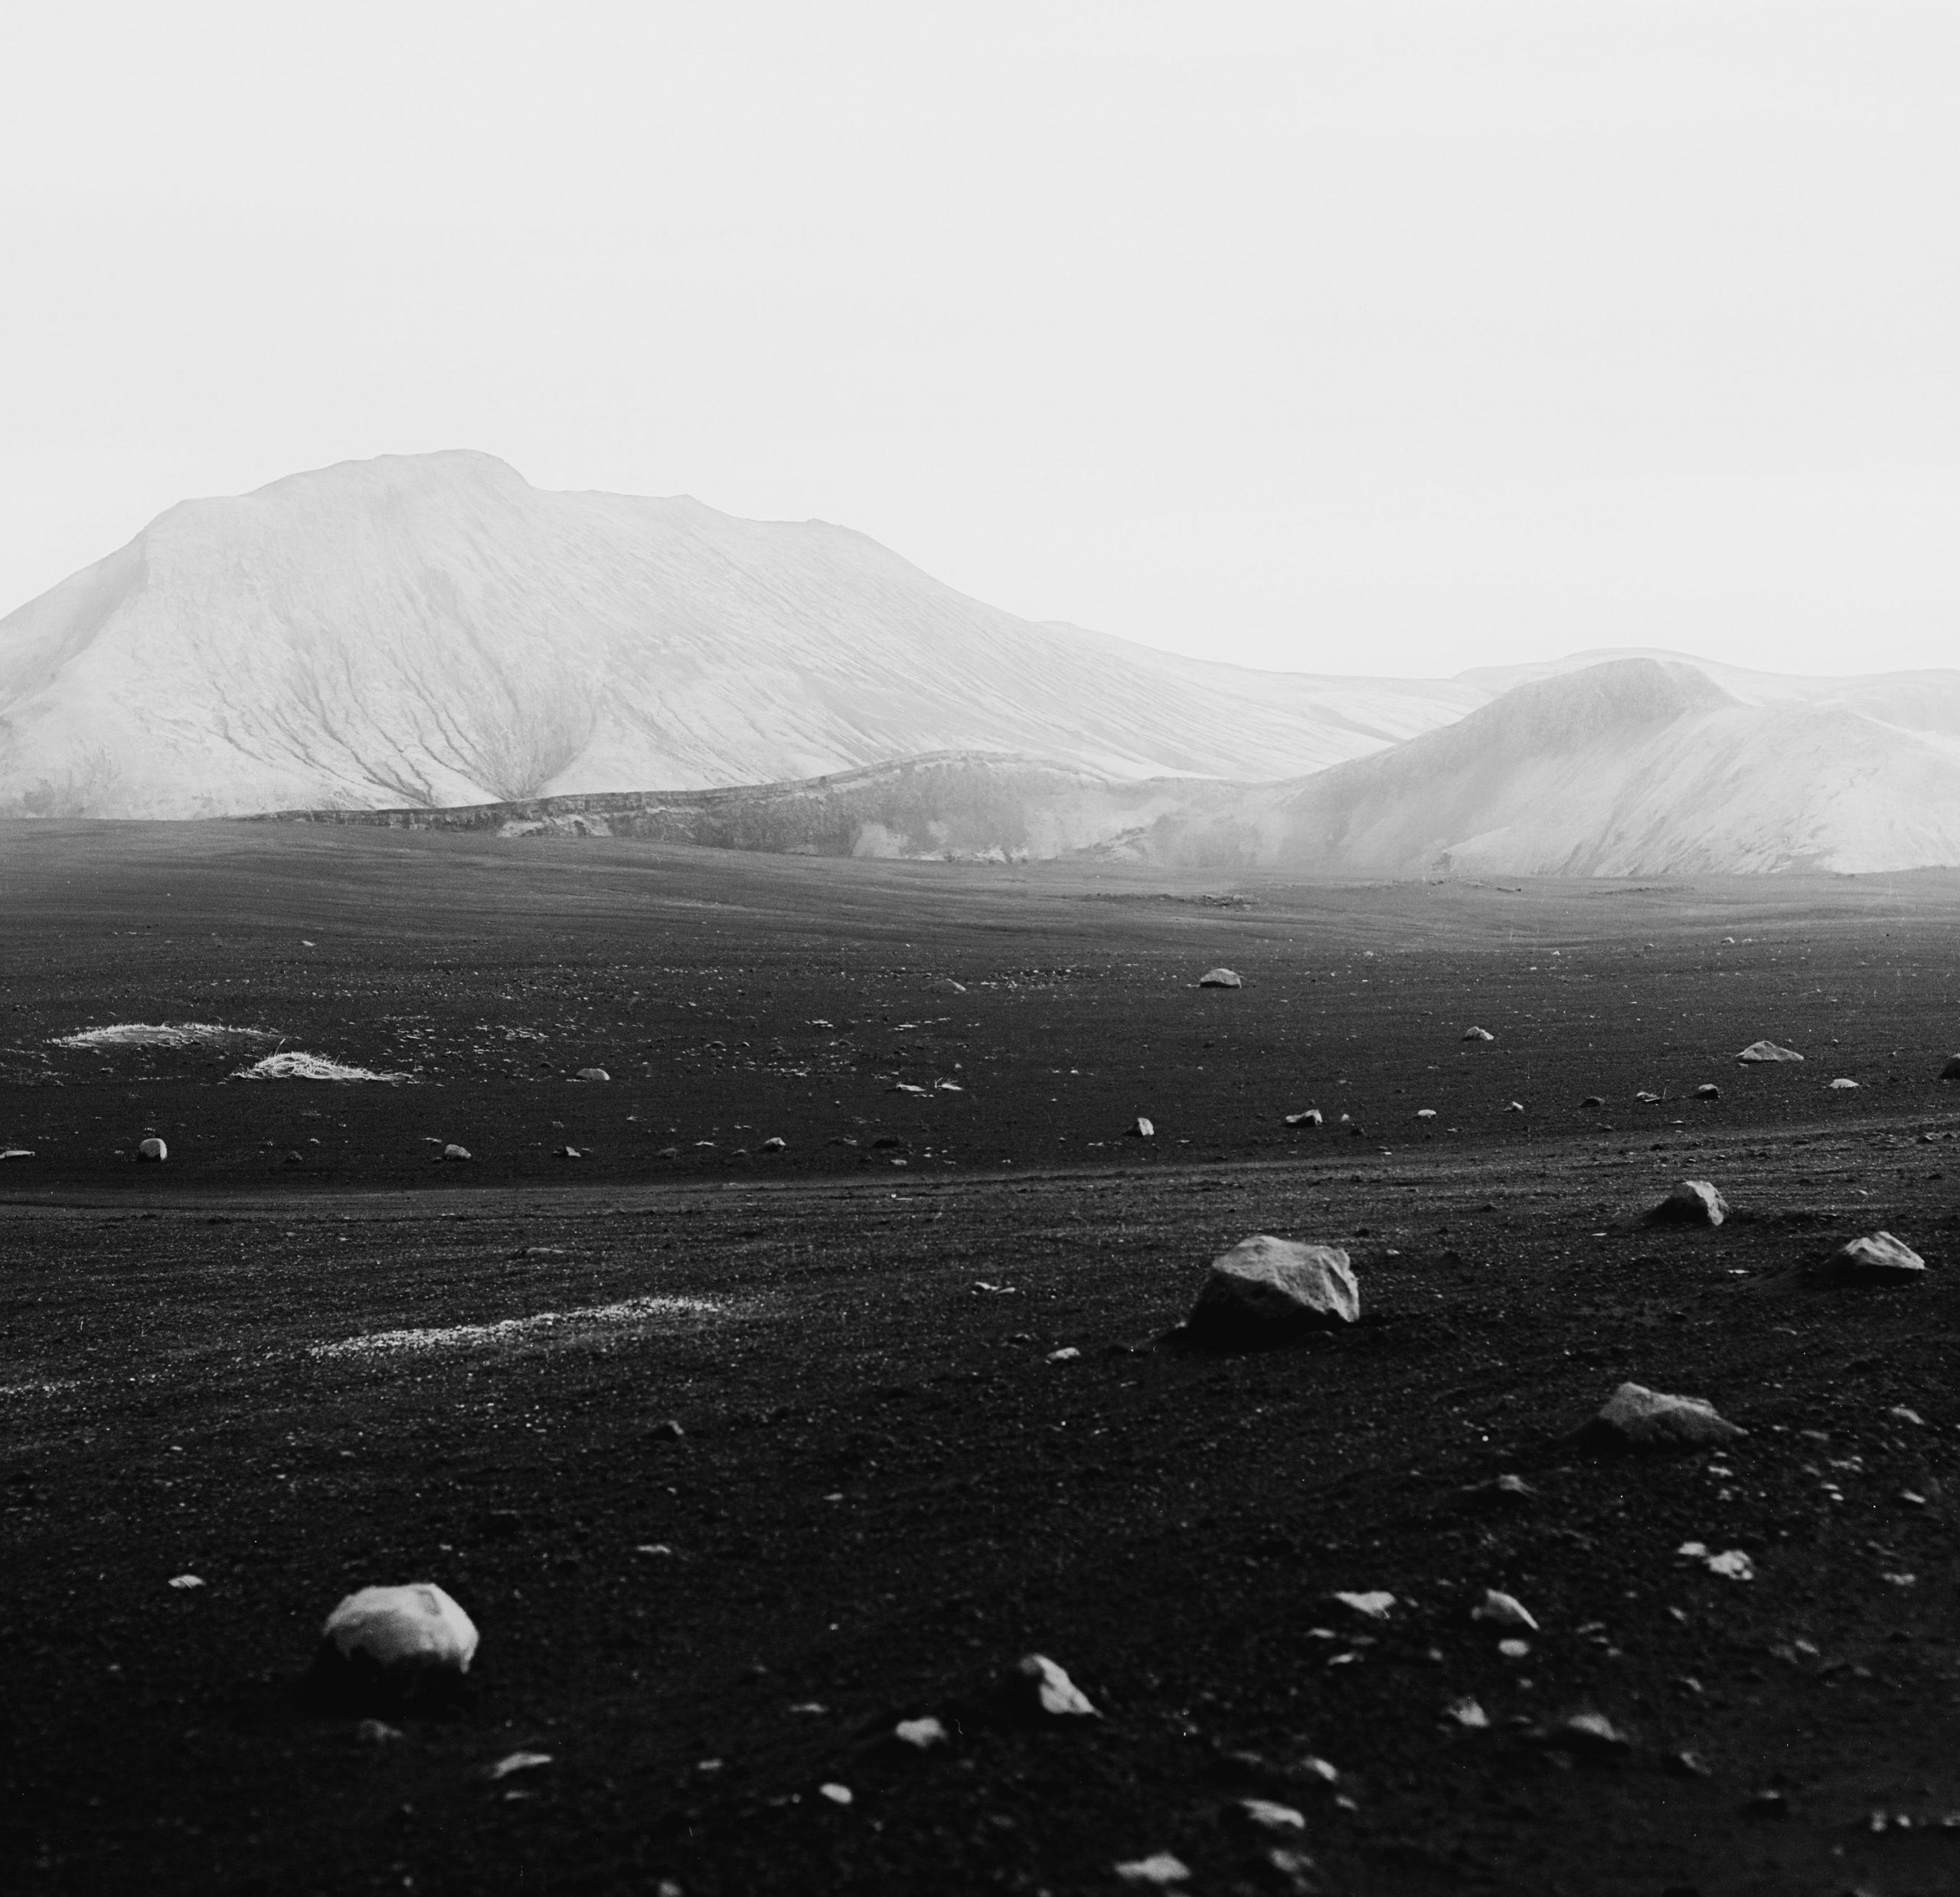 Black & white photograph, landscape, medium format, Iceland